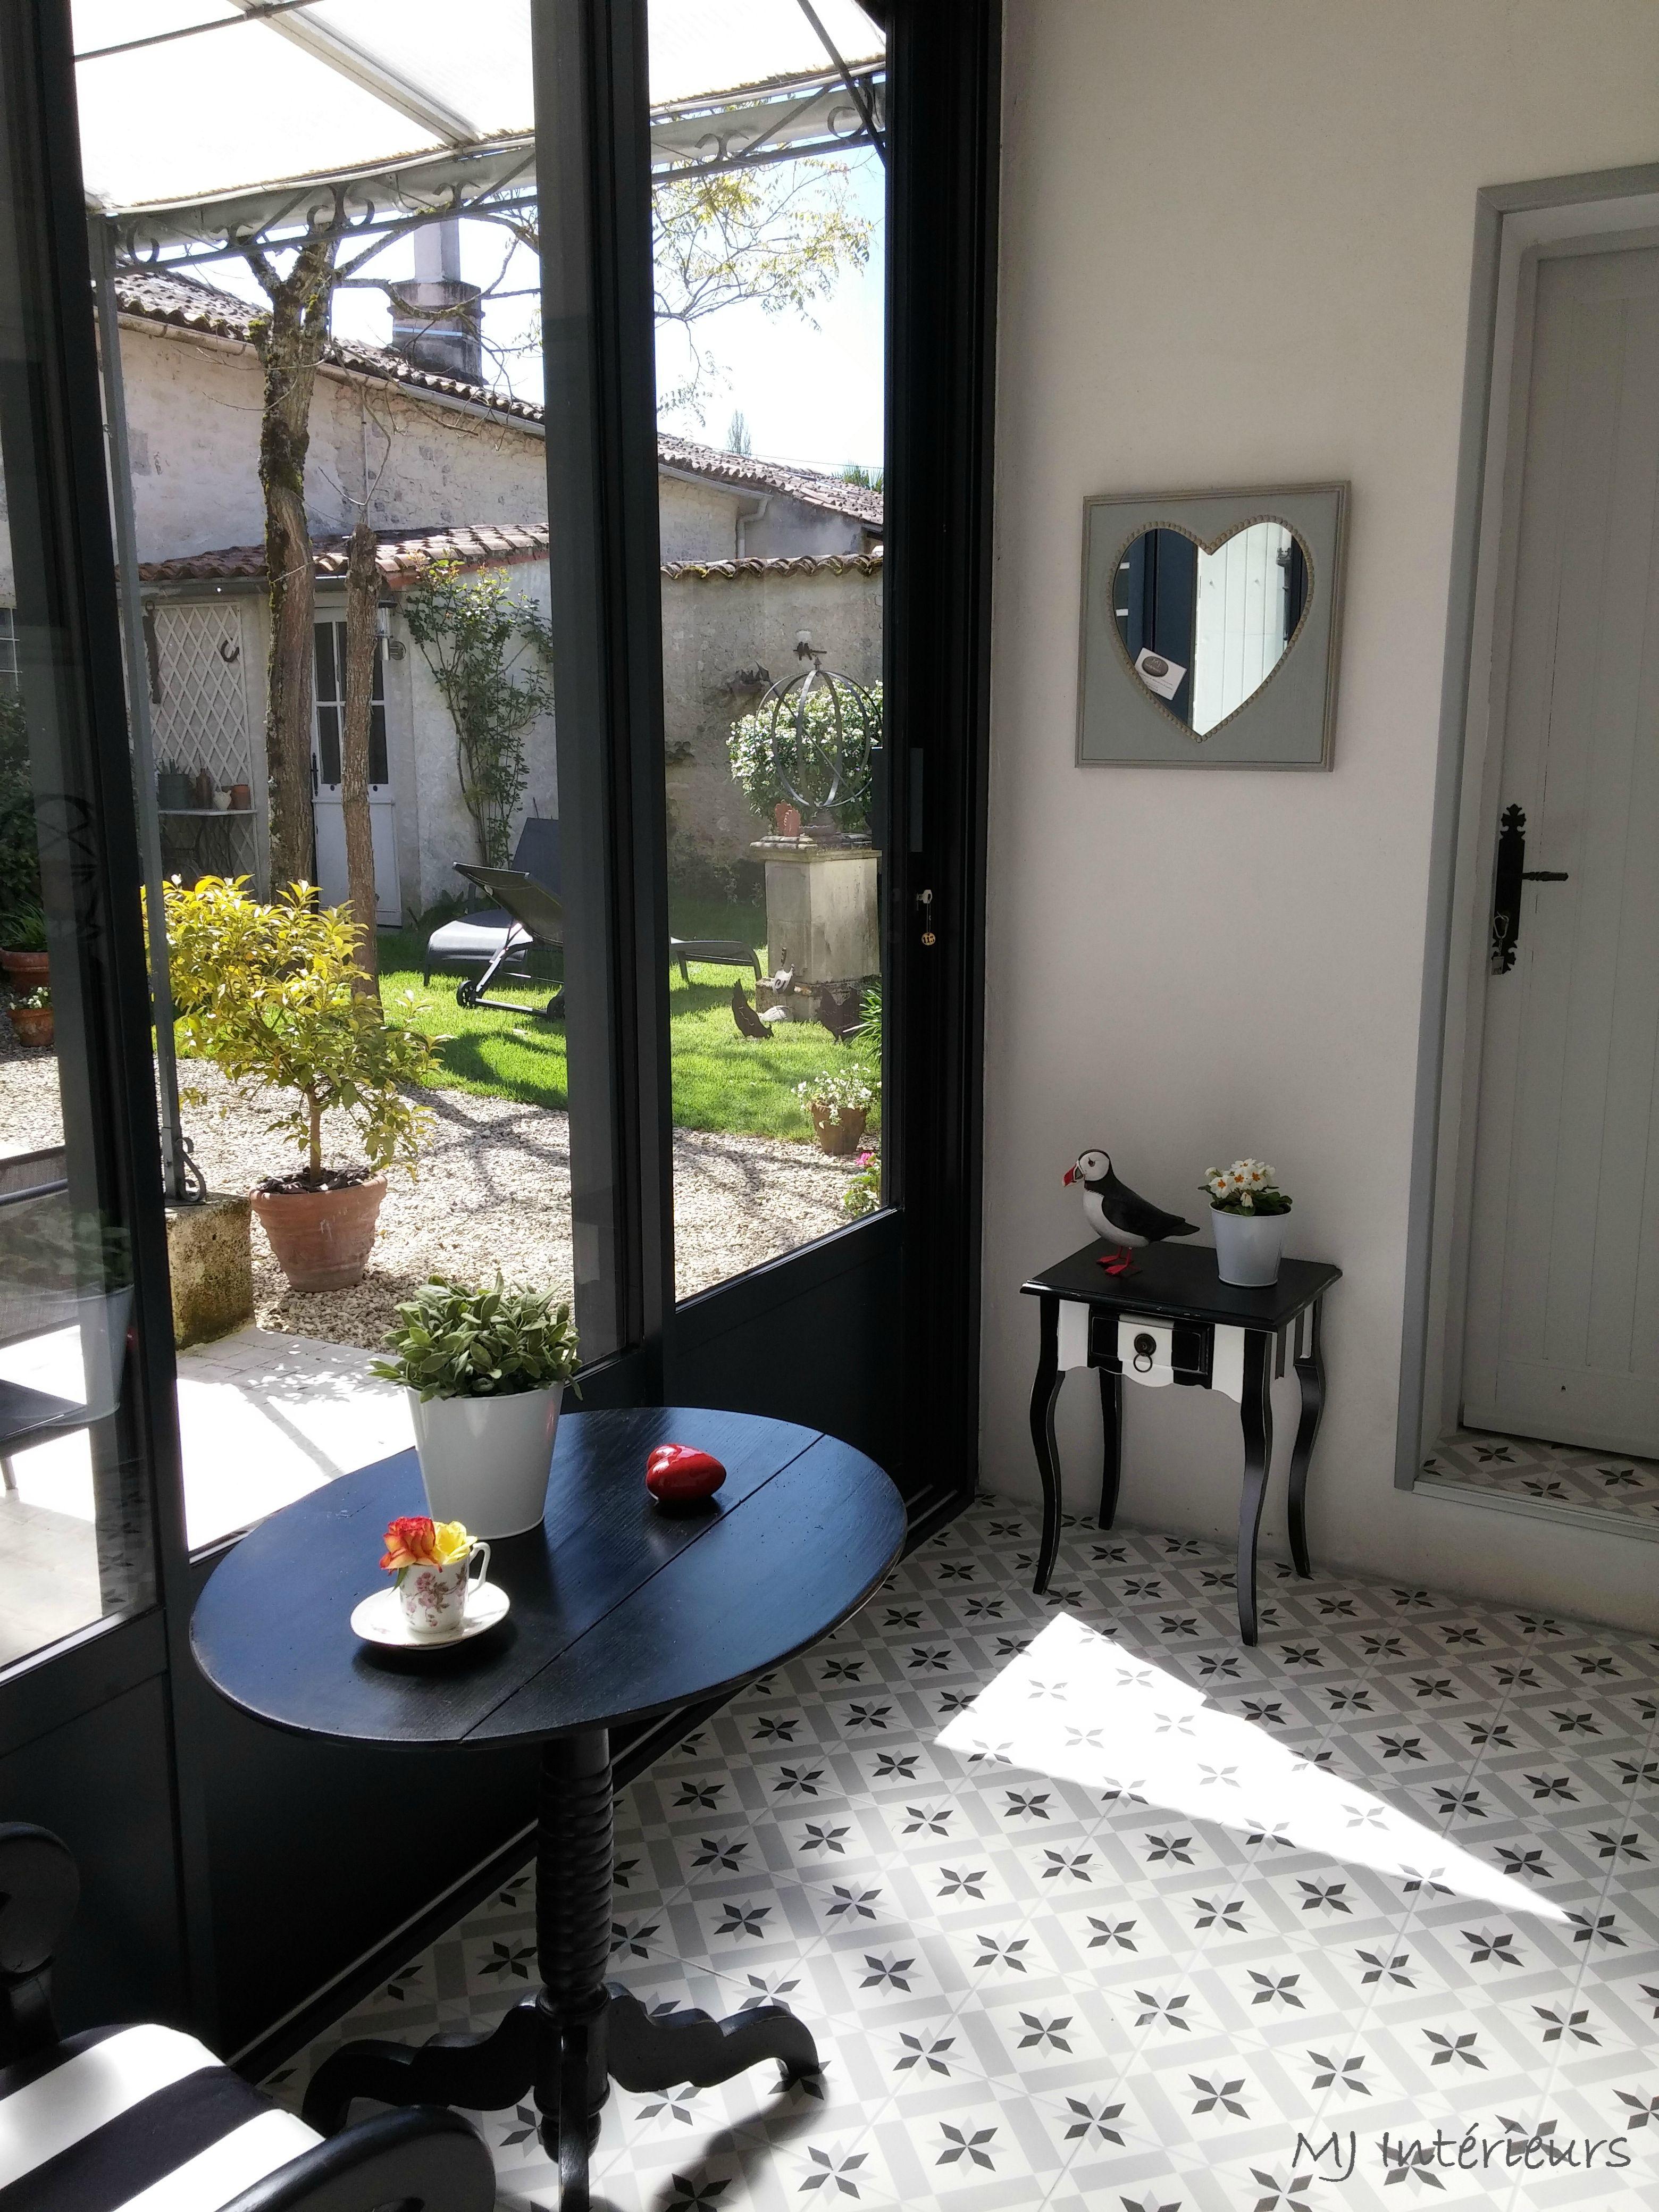 Mini Veranda Le Resultat Apres Travaux Deco Maison Decoration Interieure Decoration Veranda